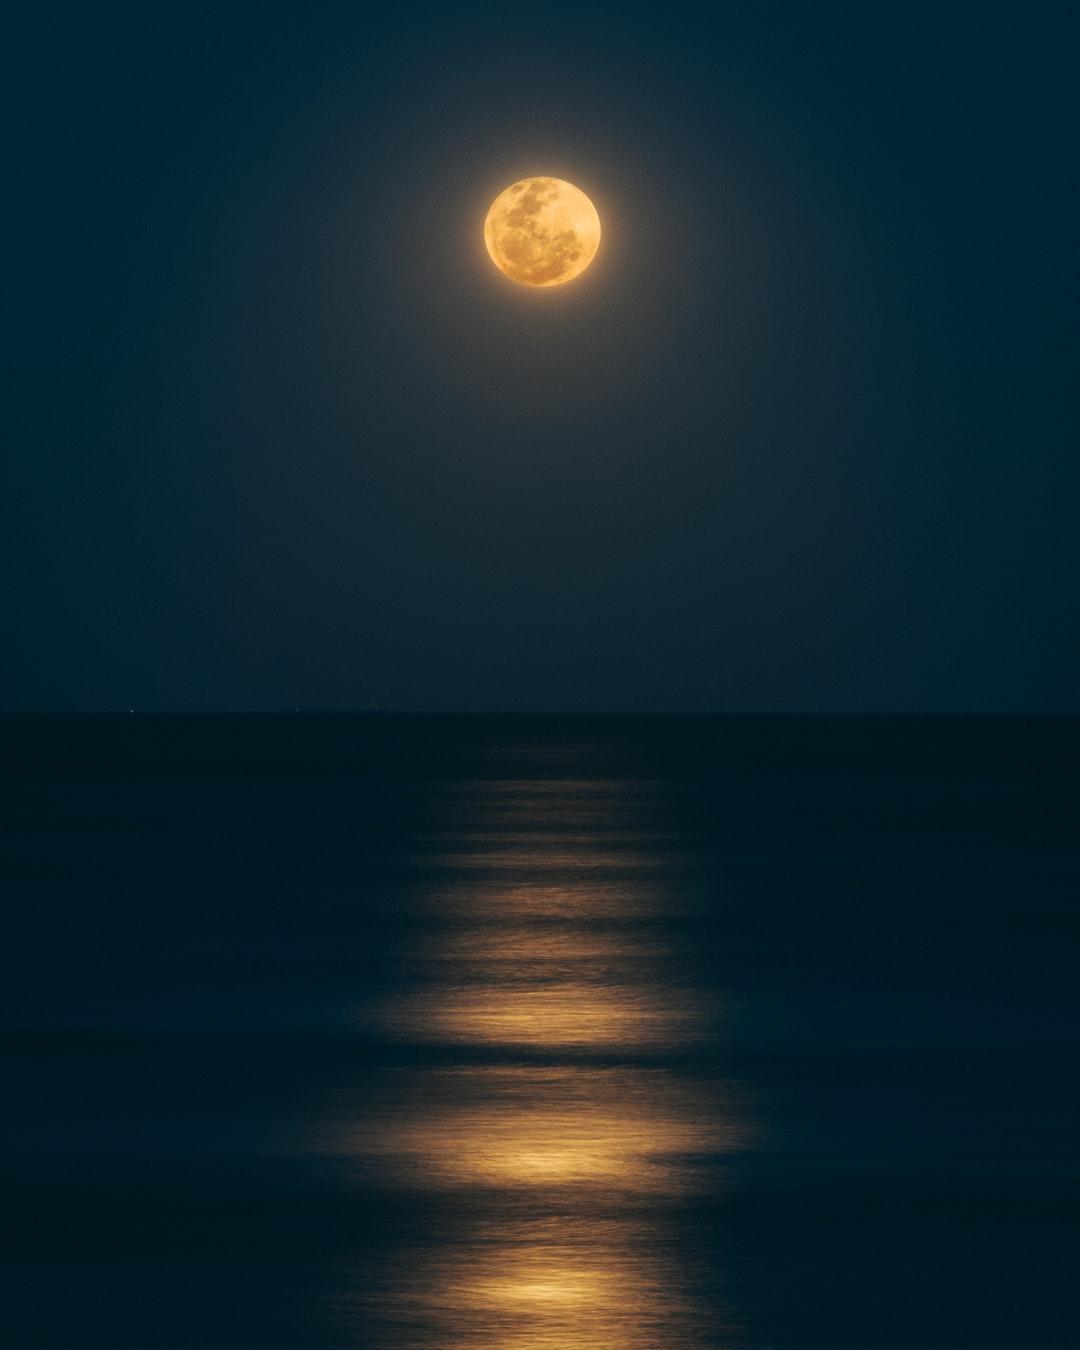 Moon Wallpaper   WallpaperHDwiki 1080x1350